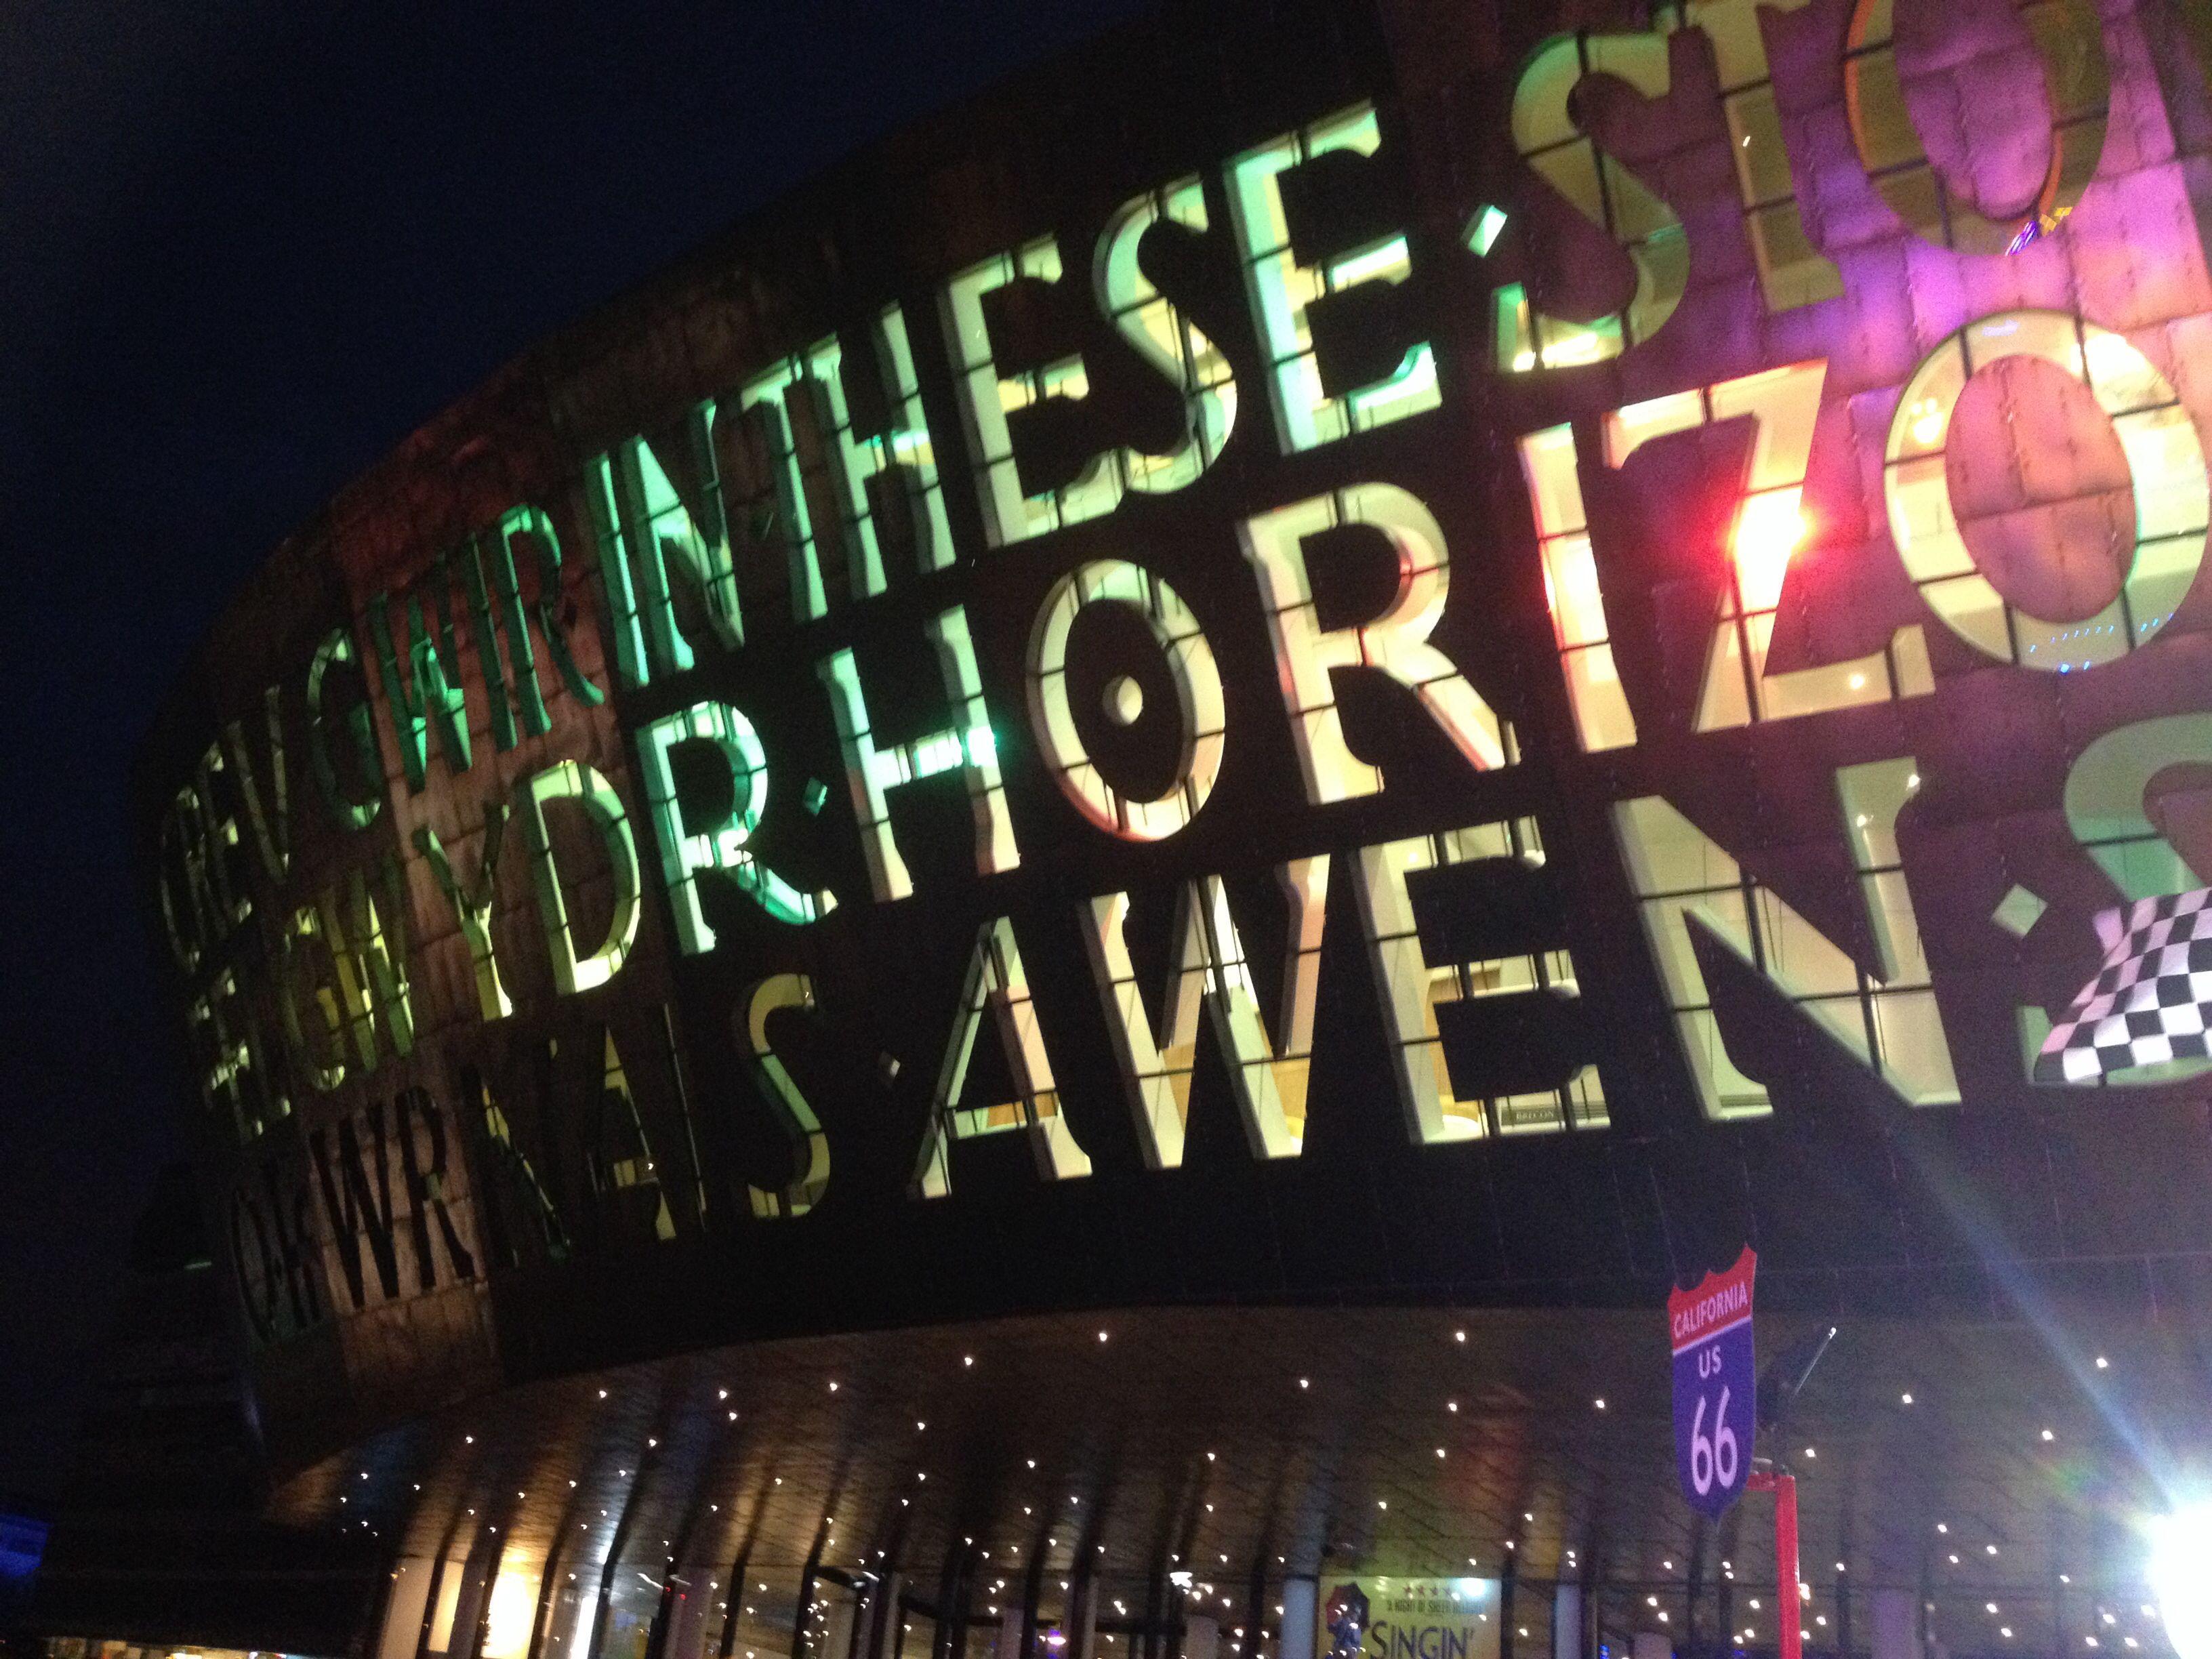 Wales Millennium Centre at night in Cardiff Bay www.callofthewild.uk